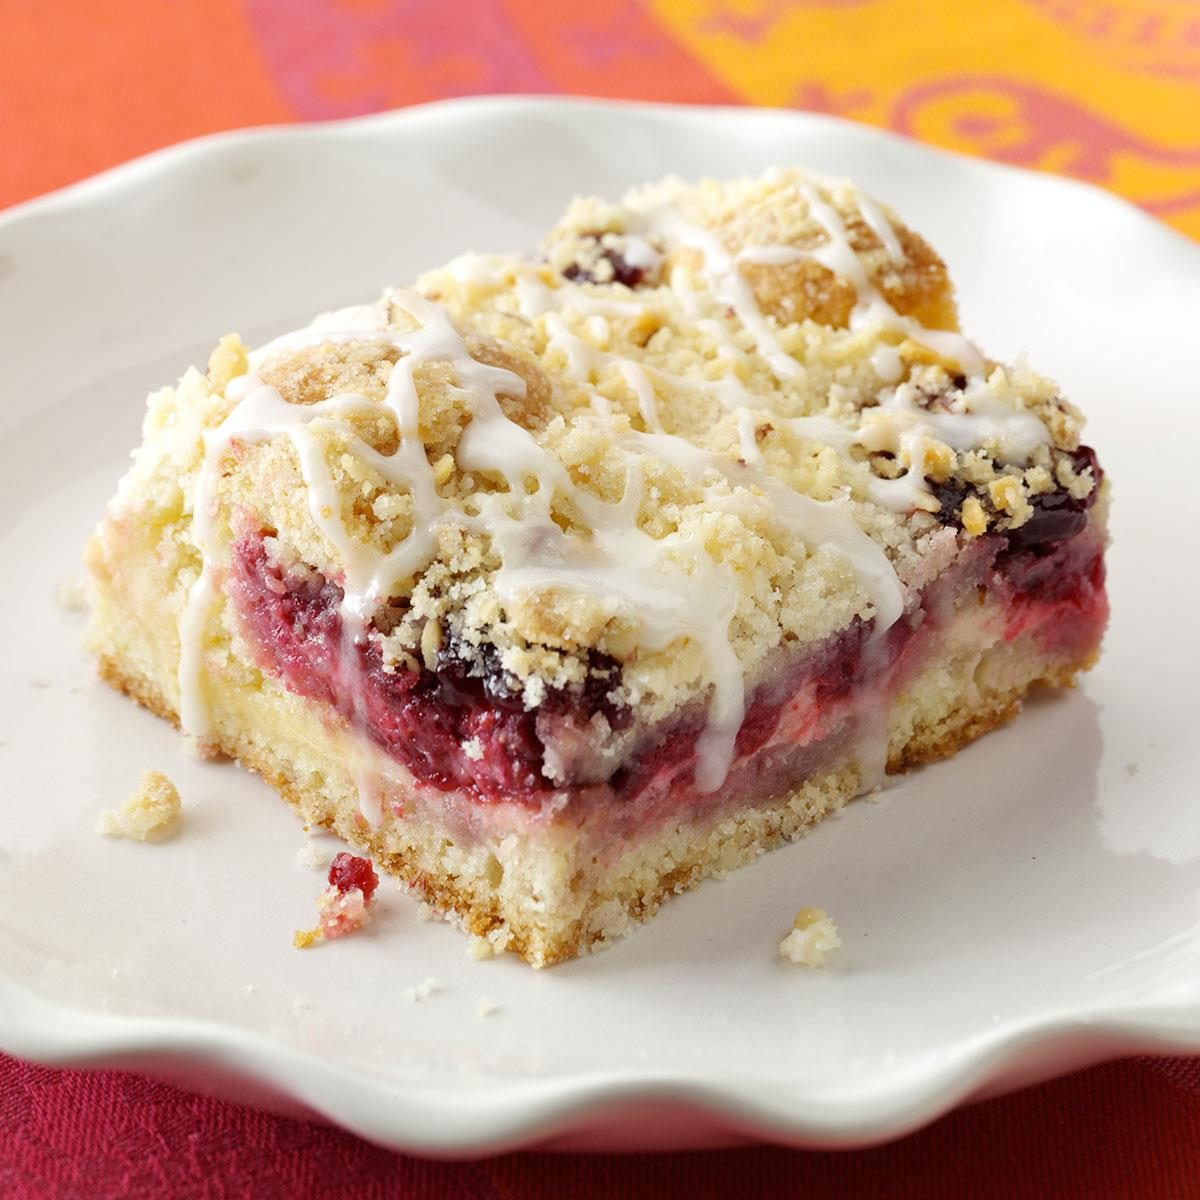 Lemon-Raspberry Streusel Cake Recipe